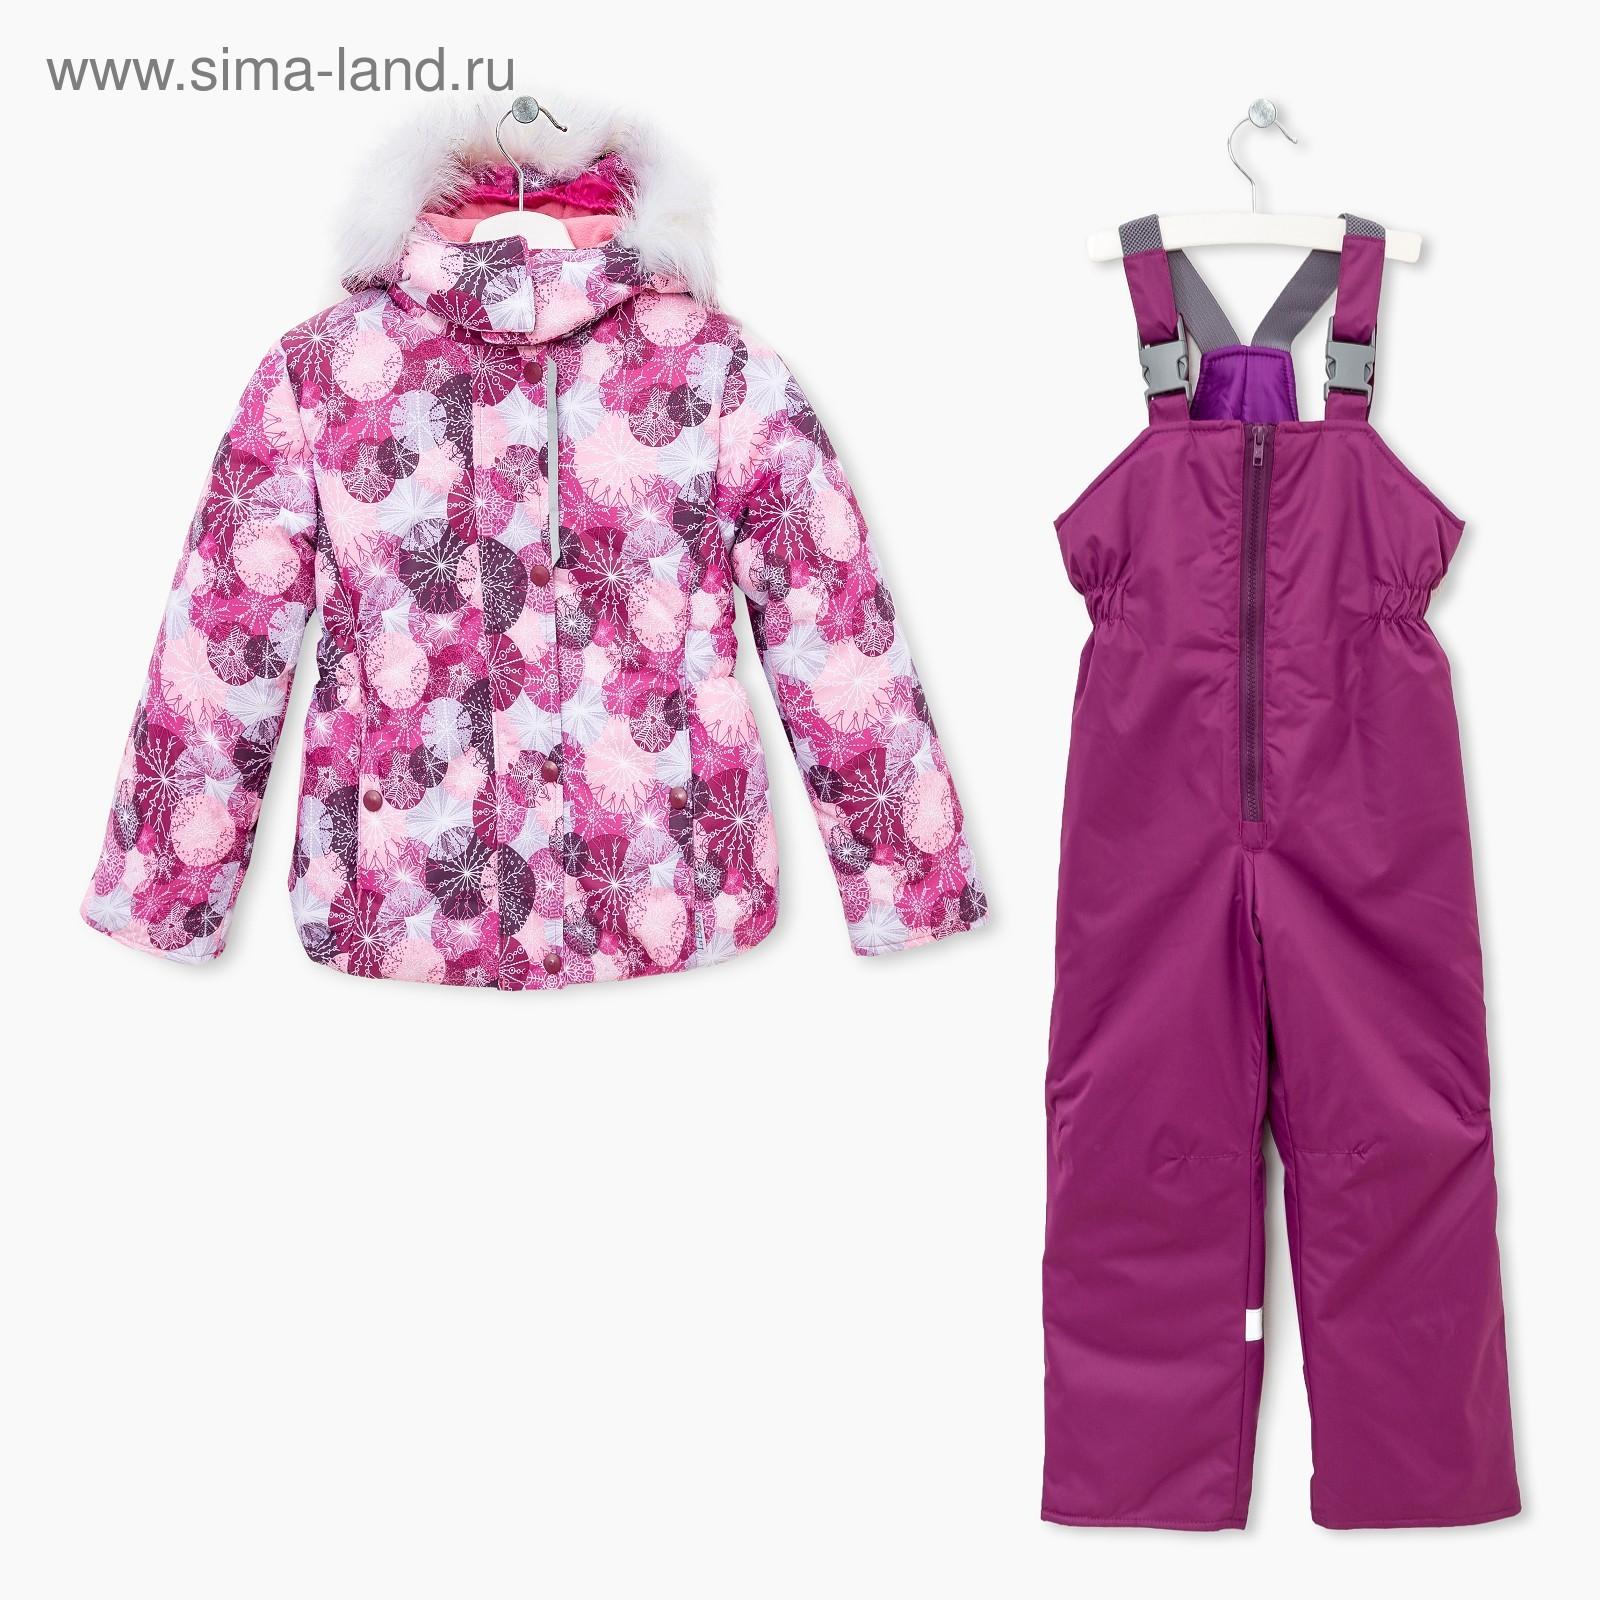 Комплект зимний для девочки (куртка,п комбинезон)